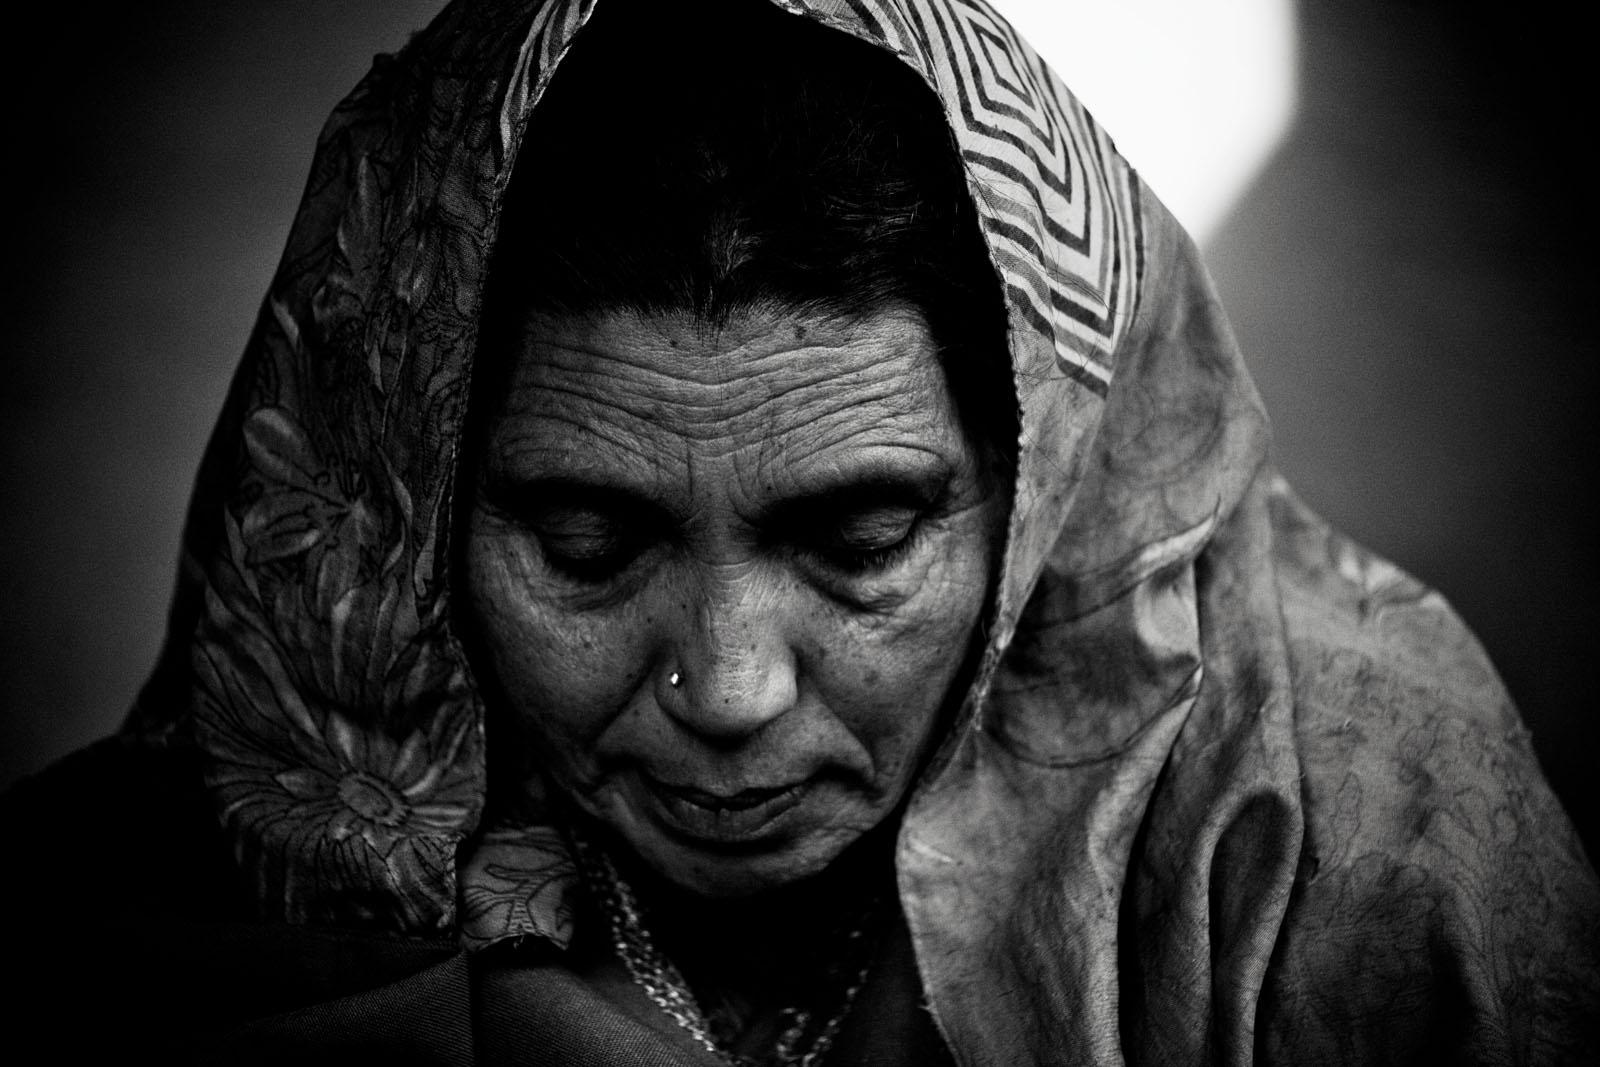 Khadija in her home in north Kashmir